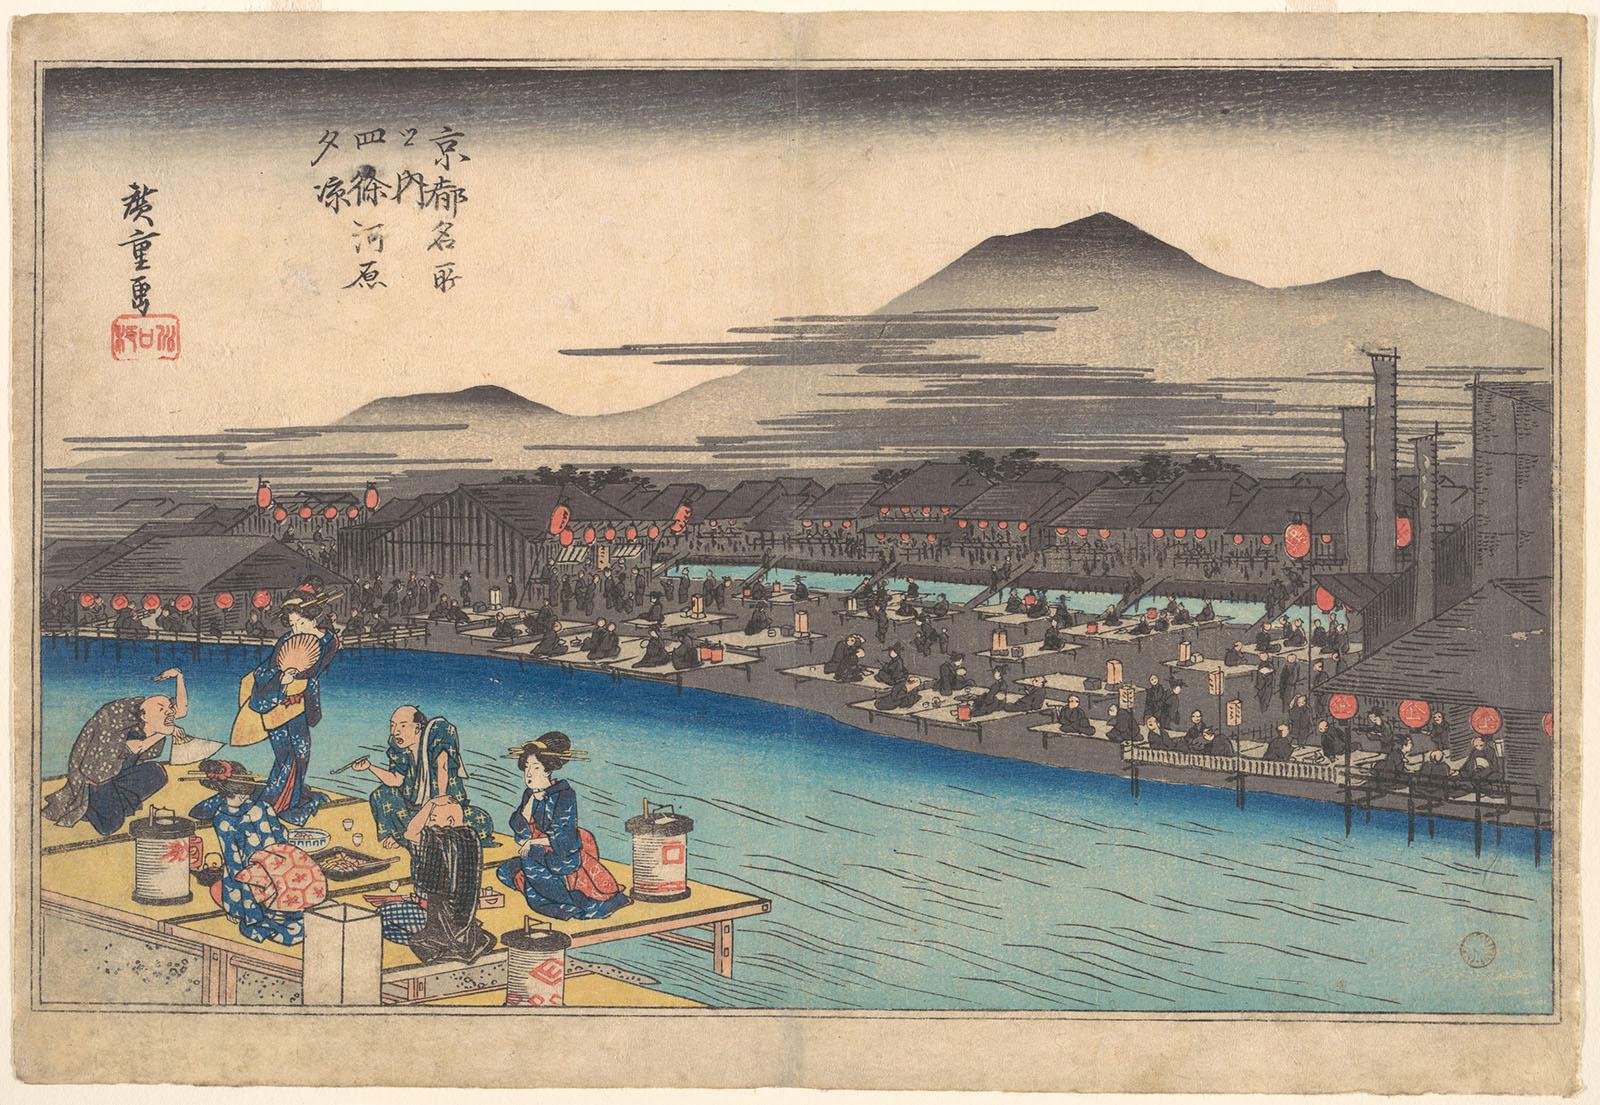 Utagawa Hiroshige.Refrescandose por la noche en Shijogawara. Hacia 1834. Metropolitan museum. Nueva York.